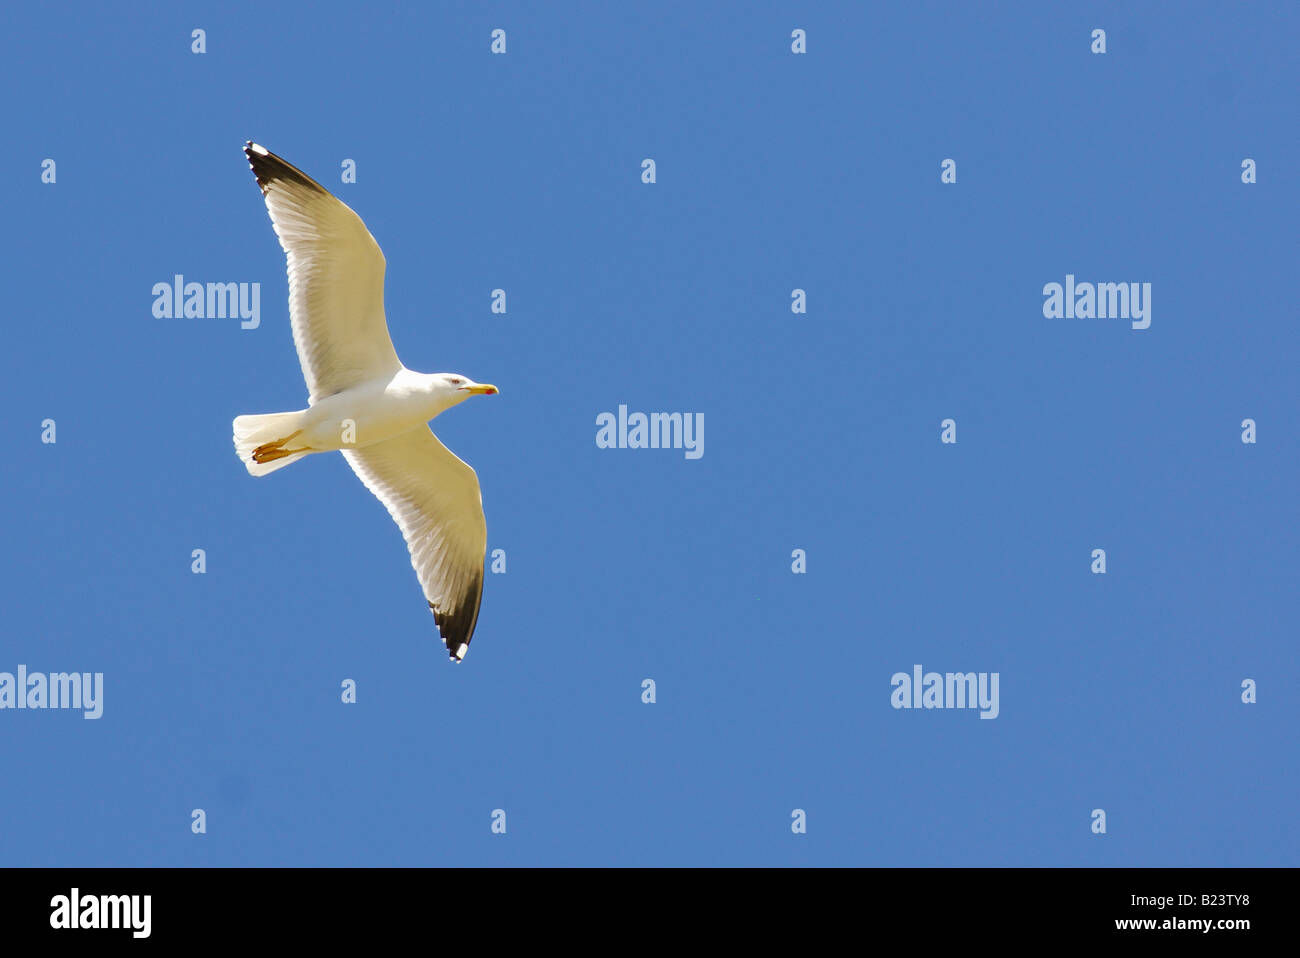 Larus argentatus, Herring Gull, Latina, Italy - Stock Image